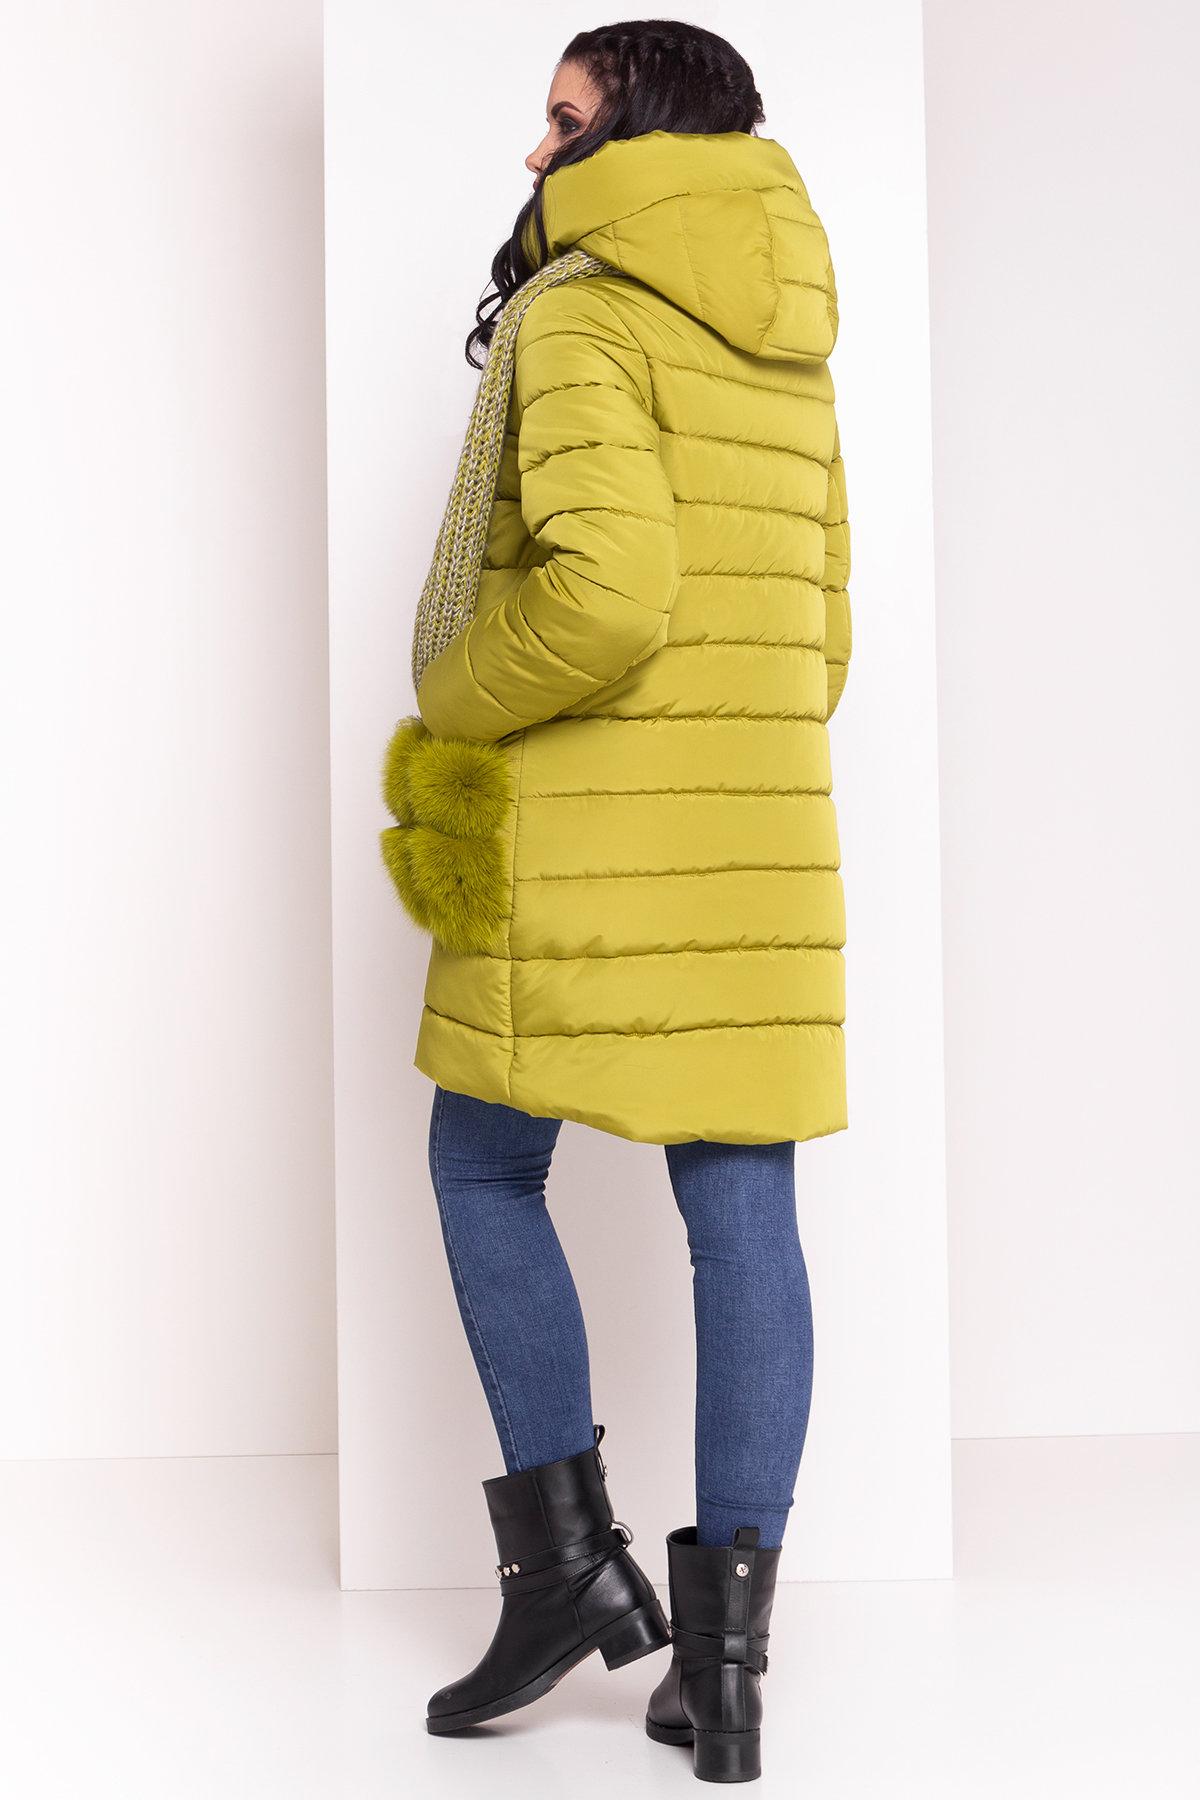 Пуховик с меховыми карманами Лили 3523 АРТ. 19152 Цвет: Олива - фото 3, интернет магазин tm-modus.ru